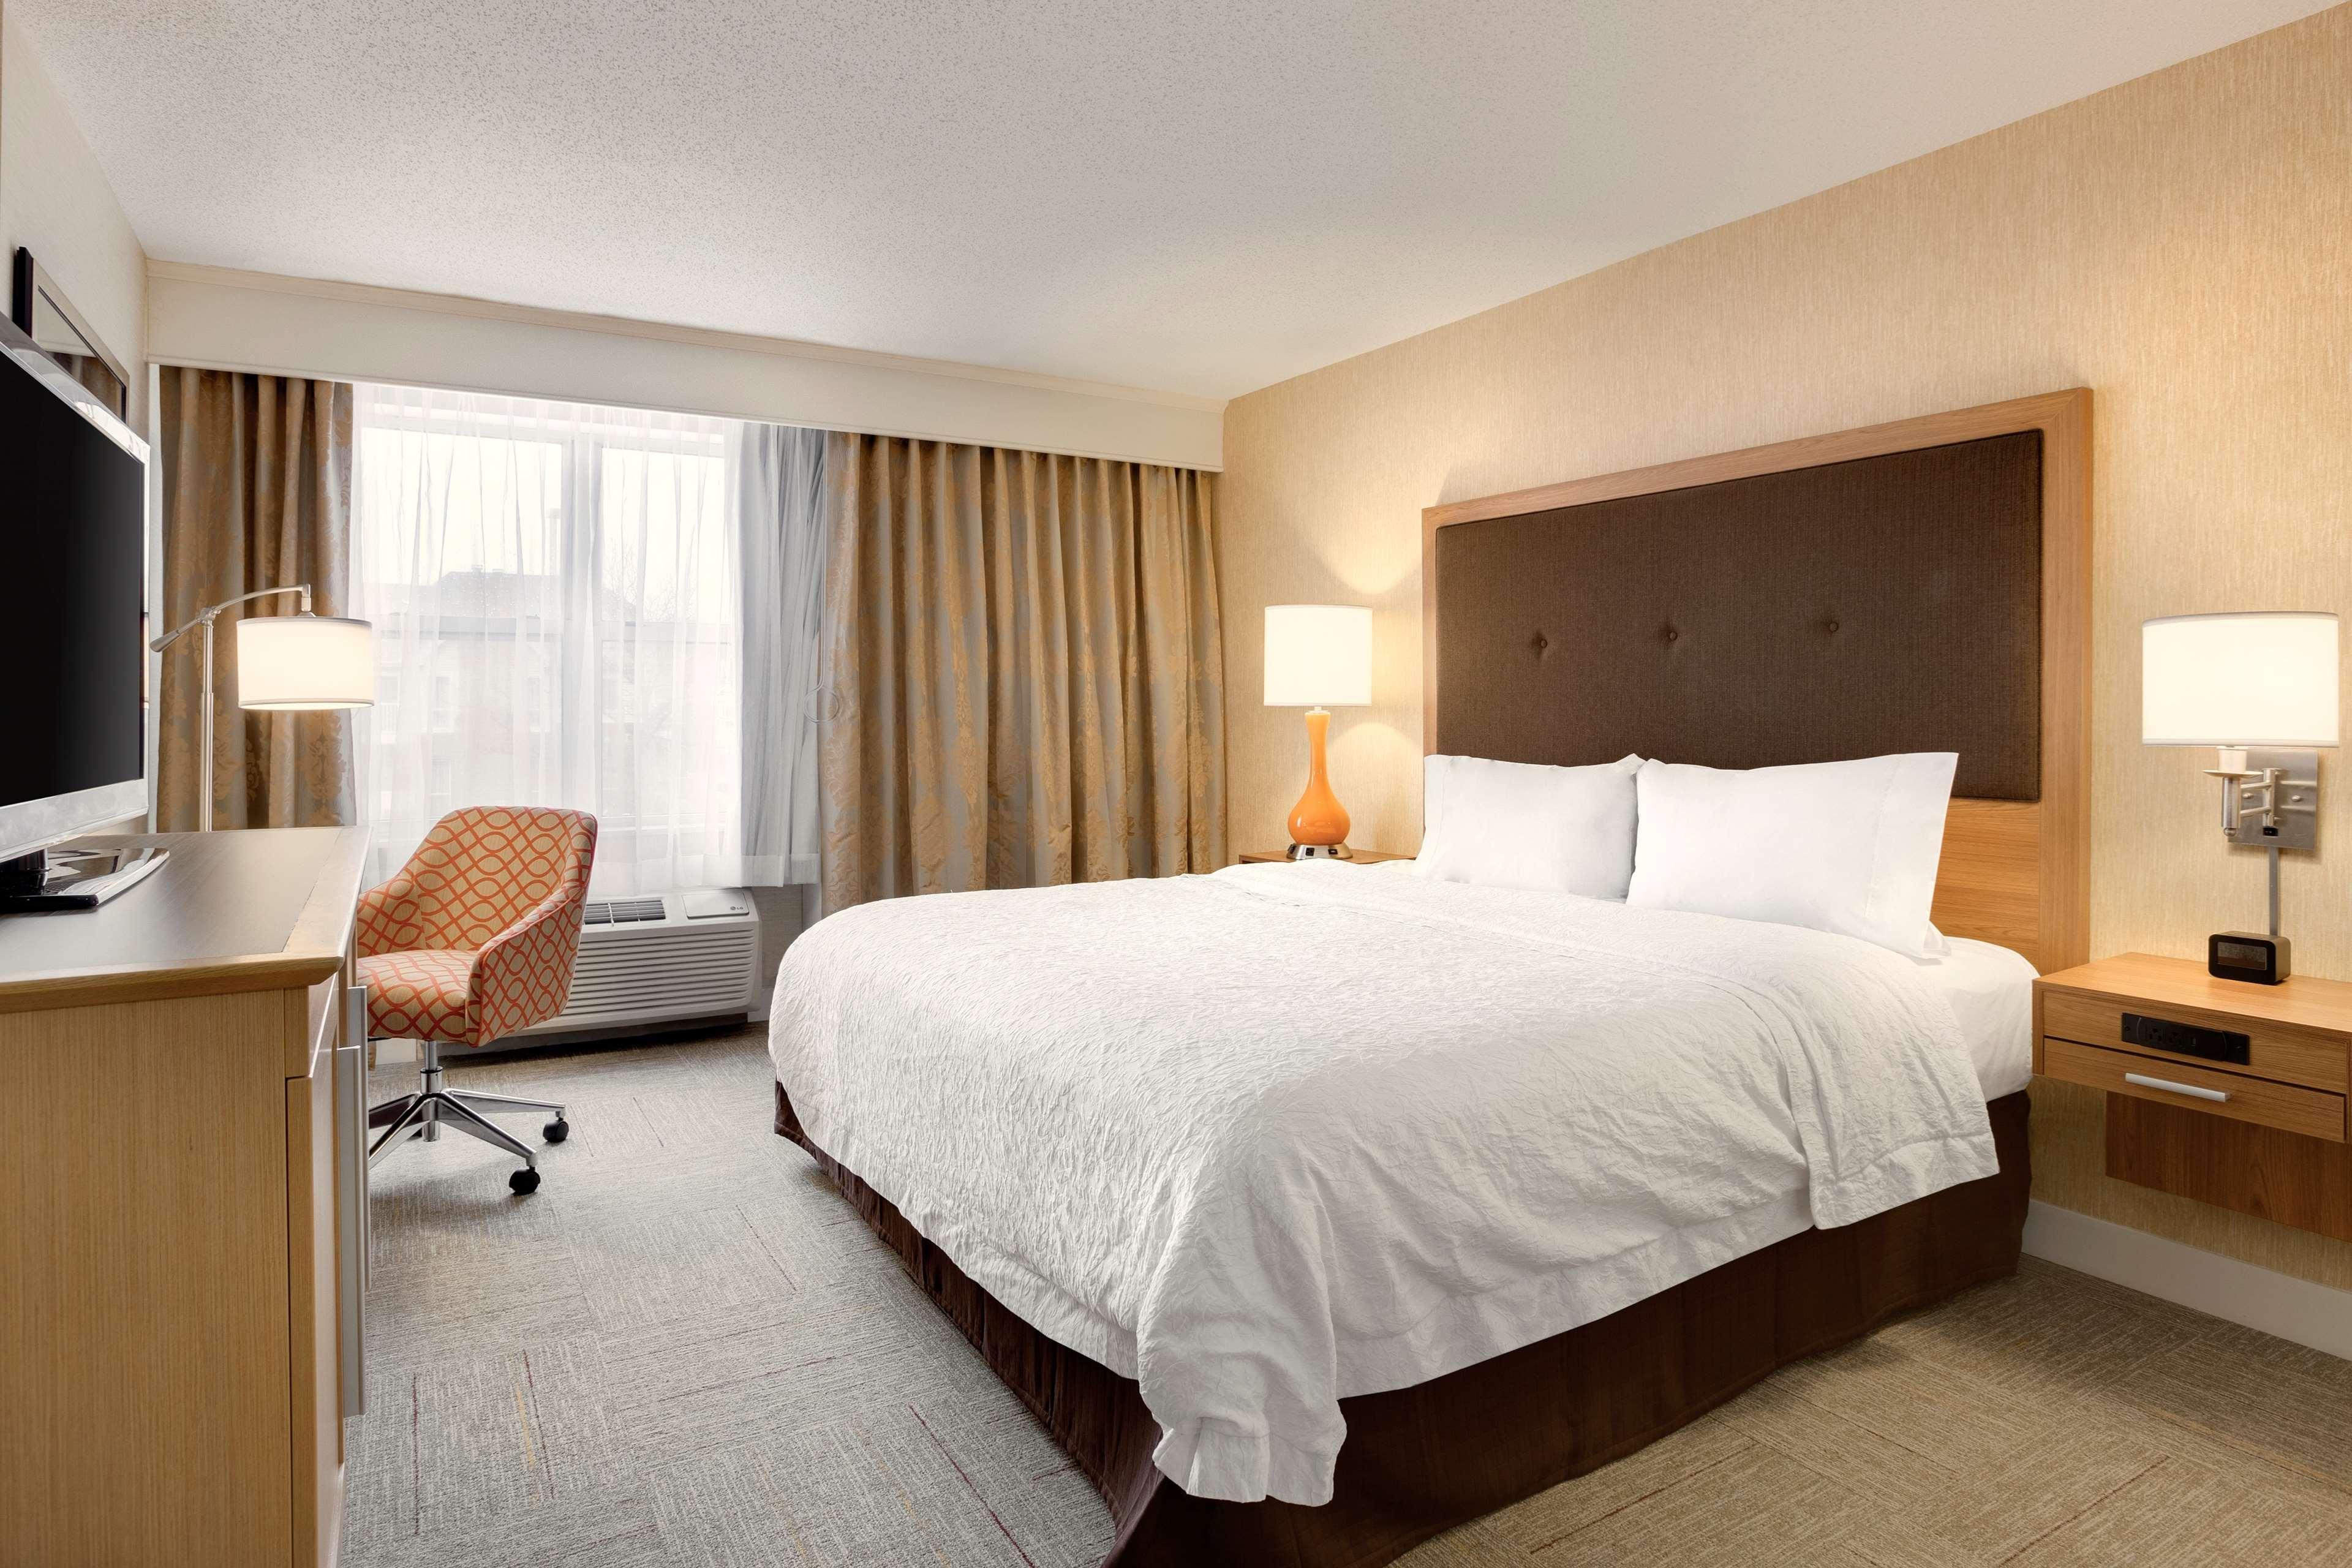 Hampton Inn & Suites Cleveland/Independence image 17